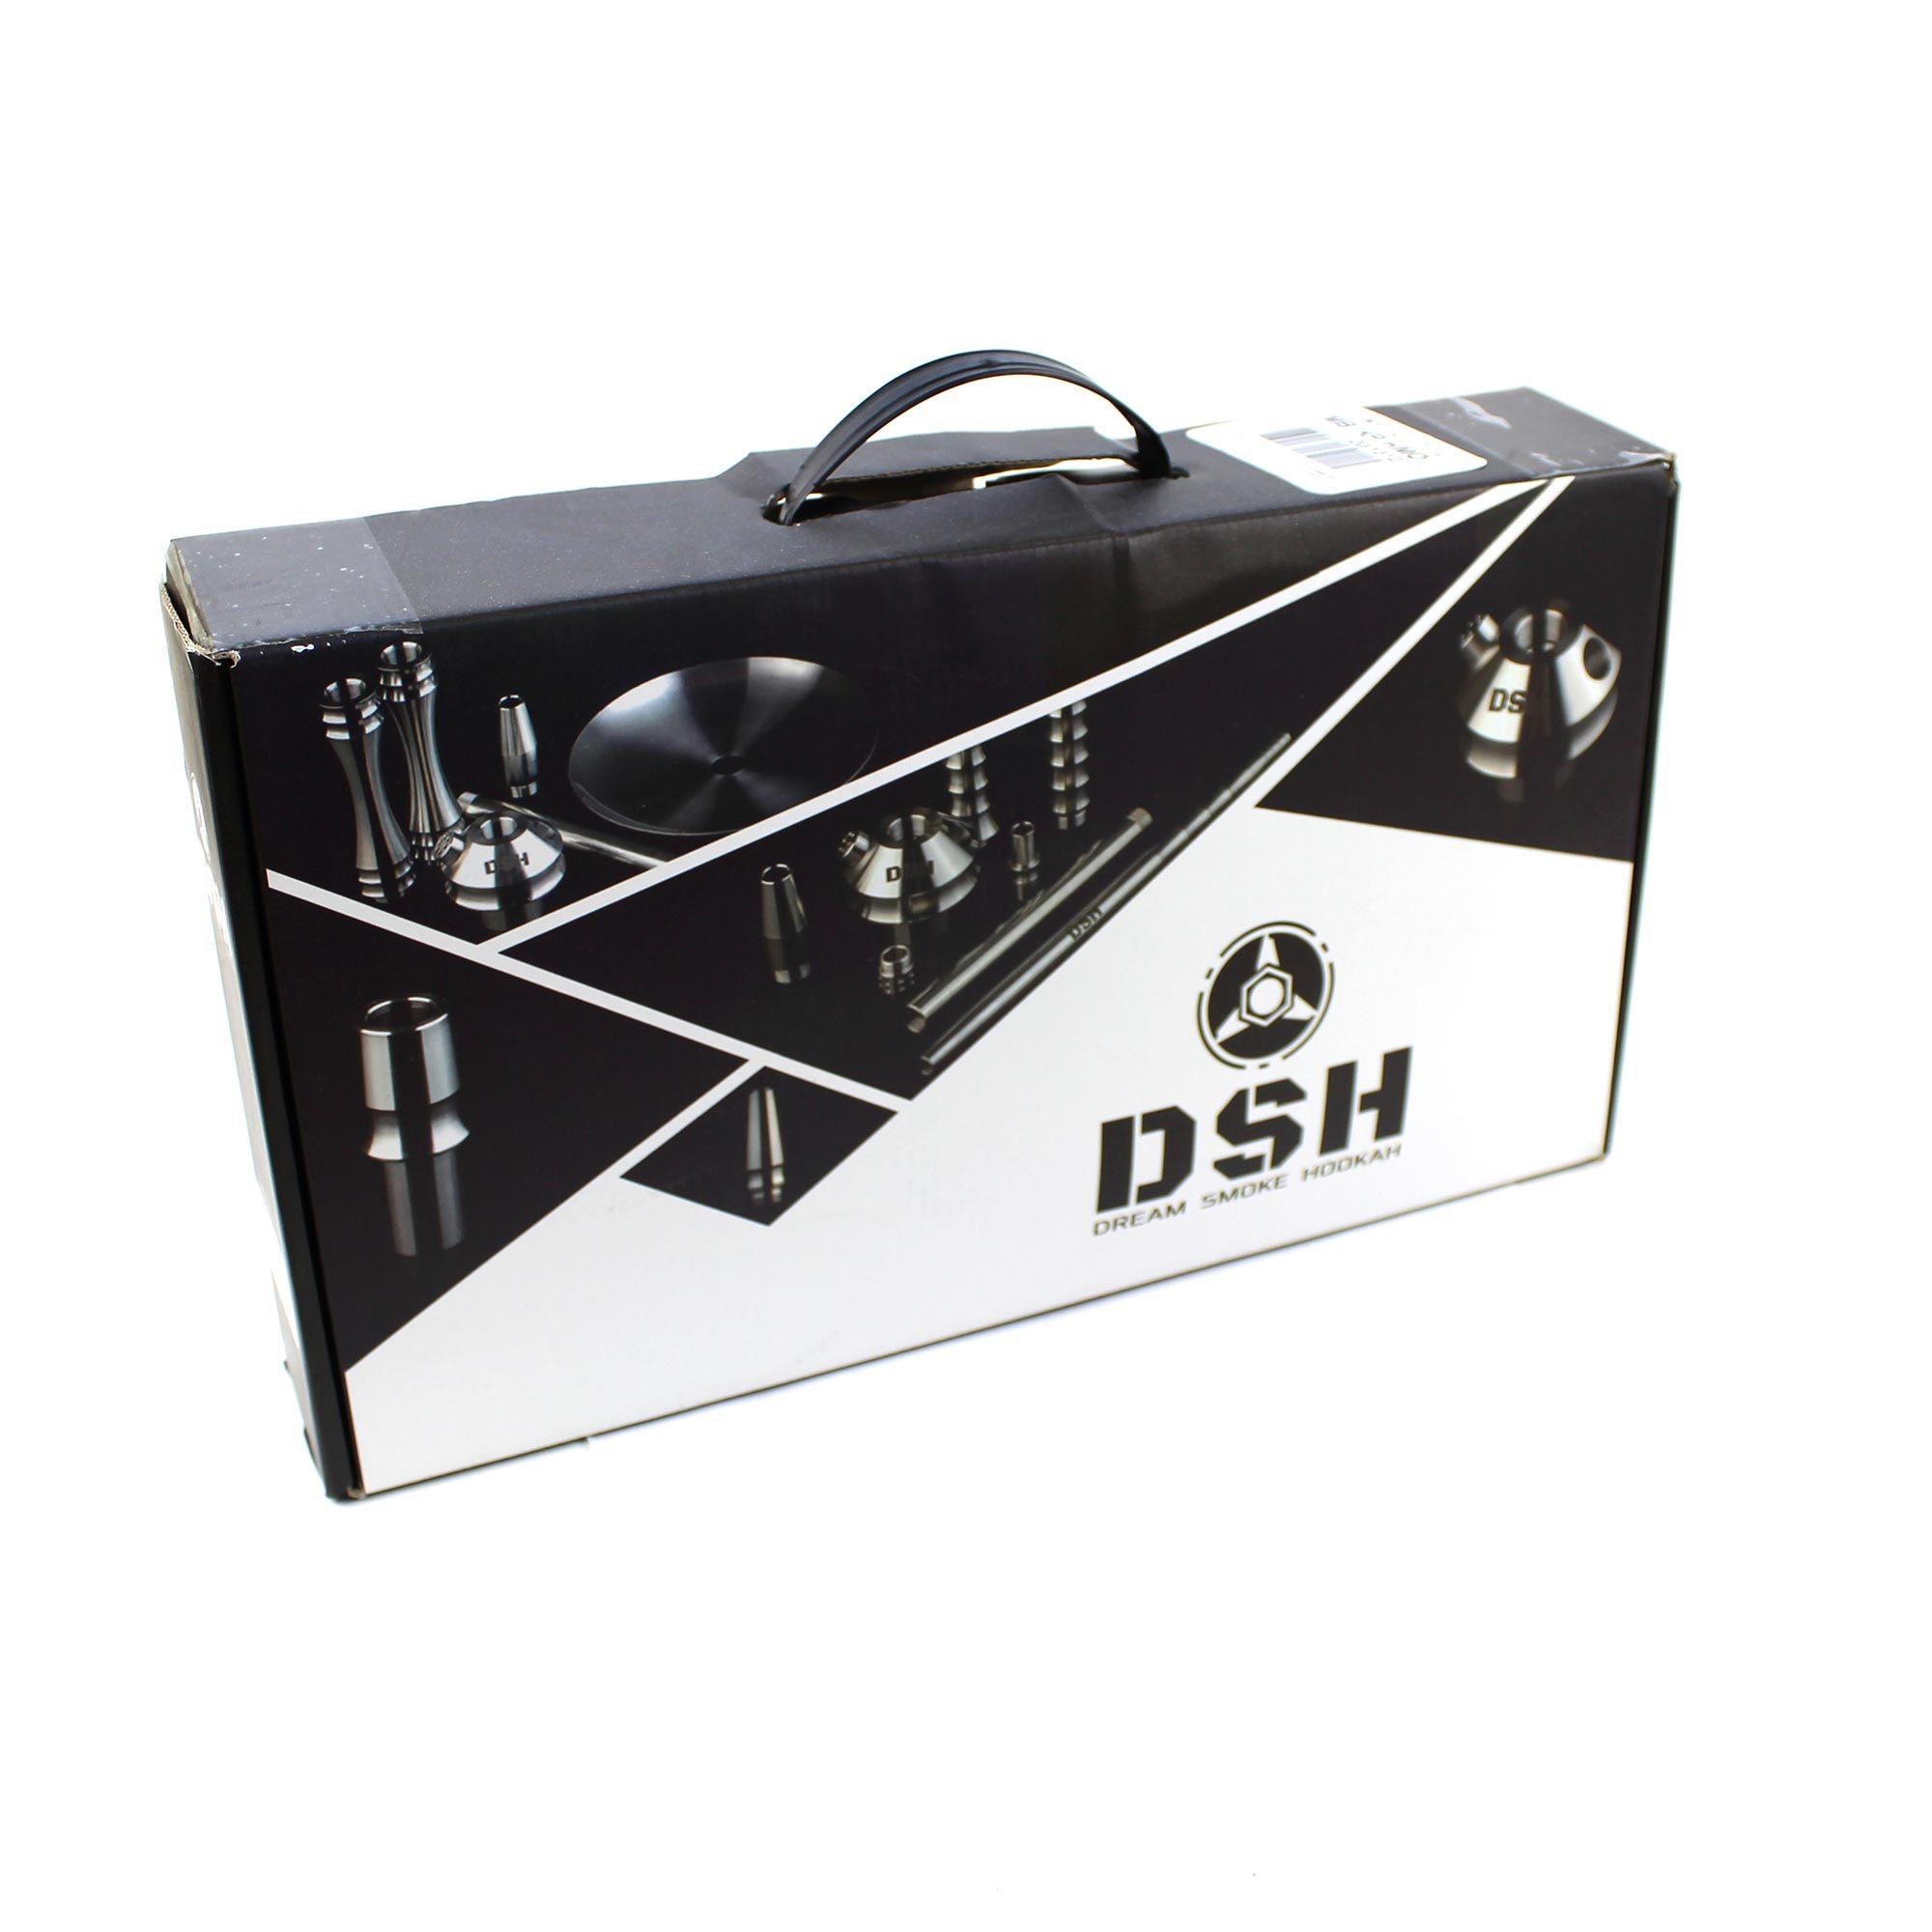 Фирменная коробка для шахты DSH (Dream Smoke Hookah)